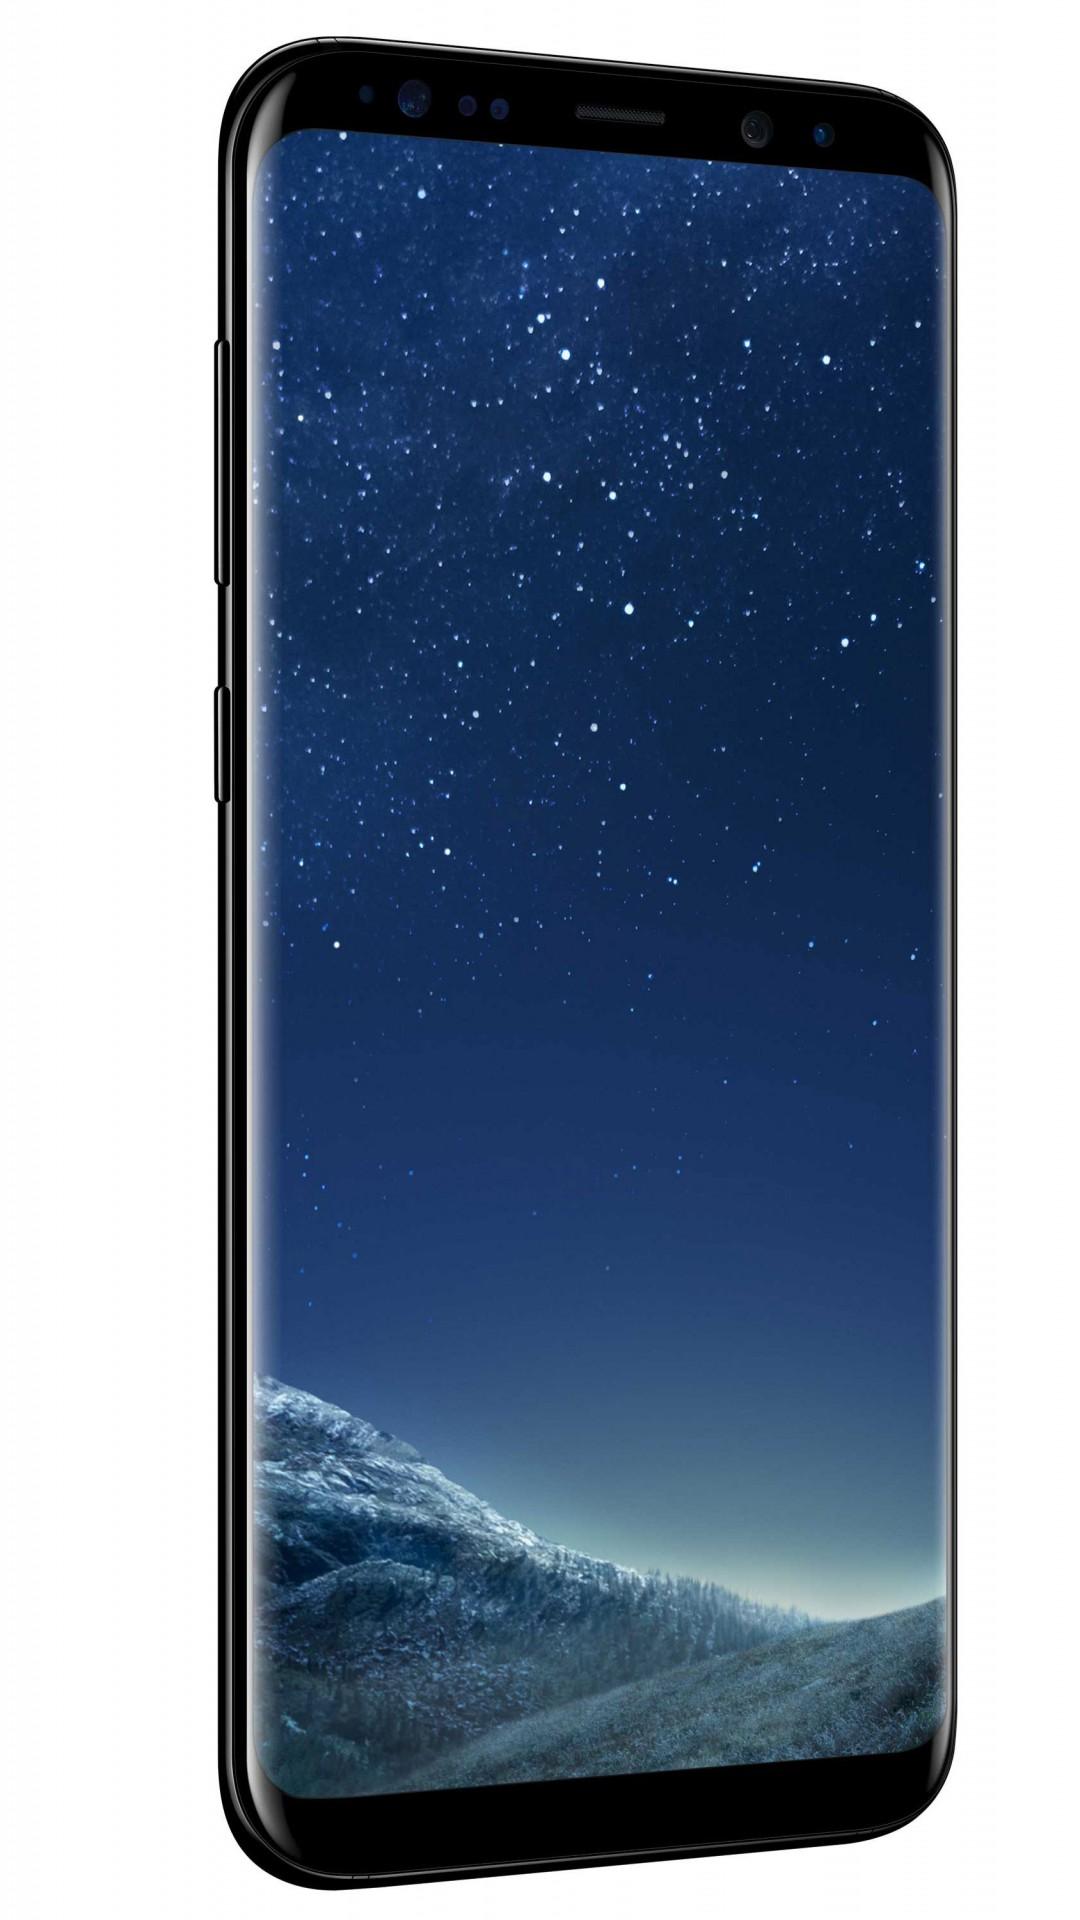 Wallpaper Samsung Galaxy S8+, 4k, Hi-Tech #16492